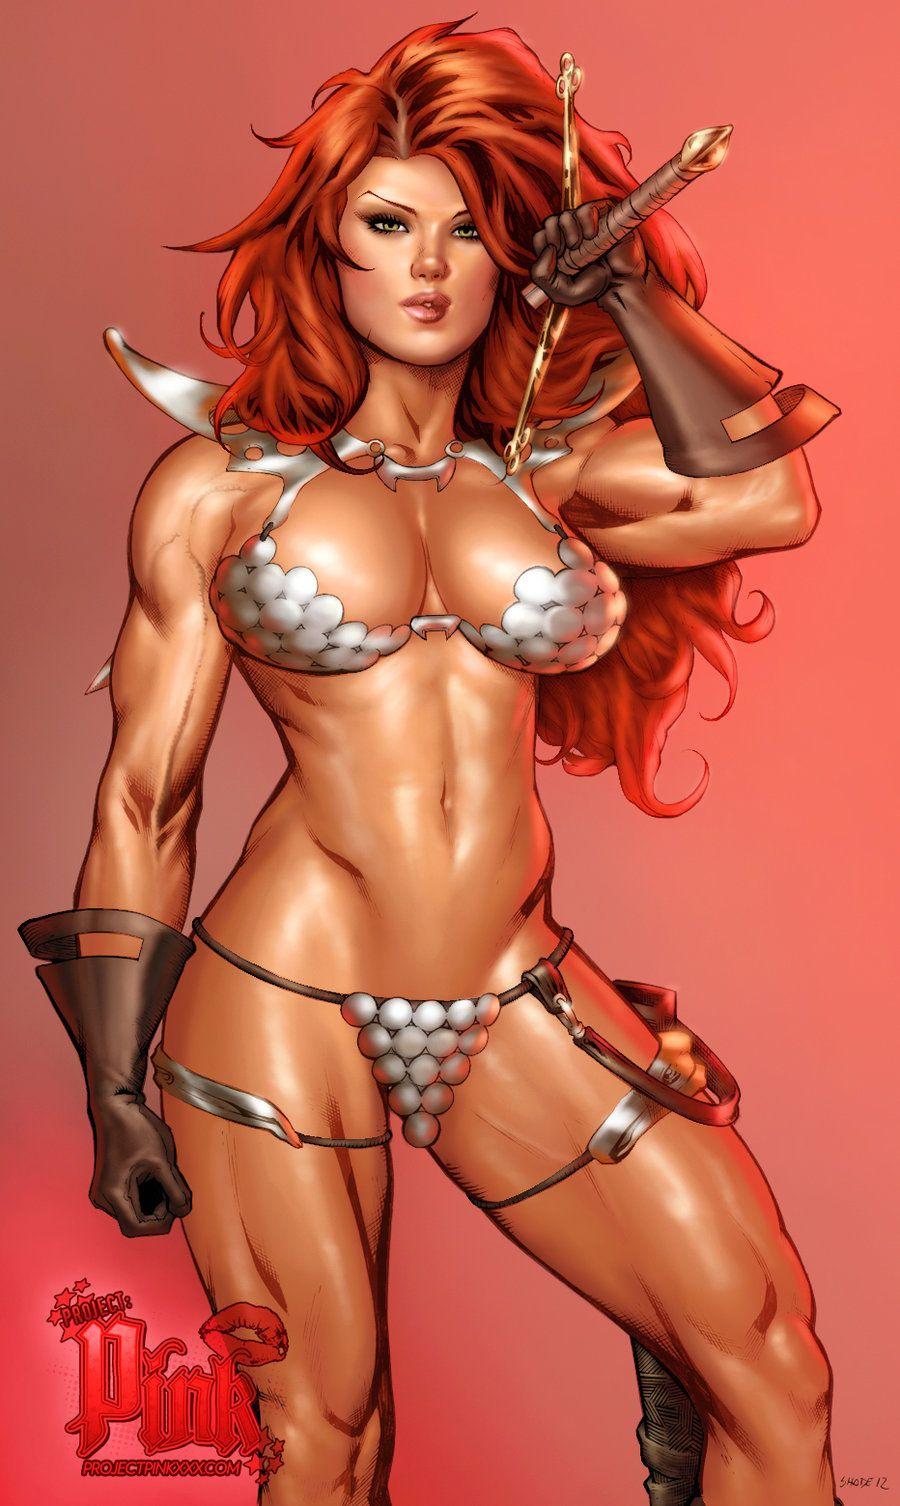 Nadia Wonder princesse amazonne niv1 8e67d3992d07c48f74daac70dd33441d